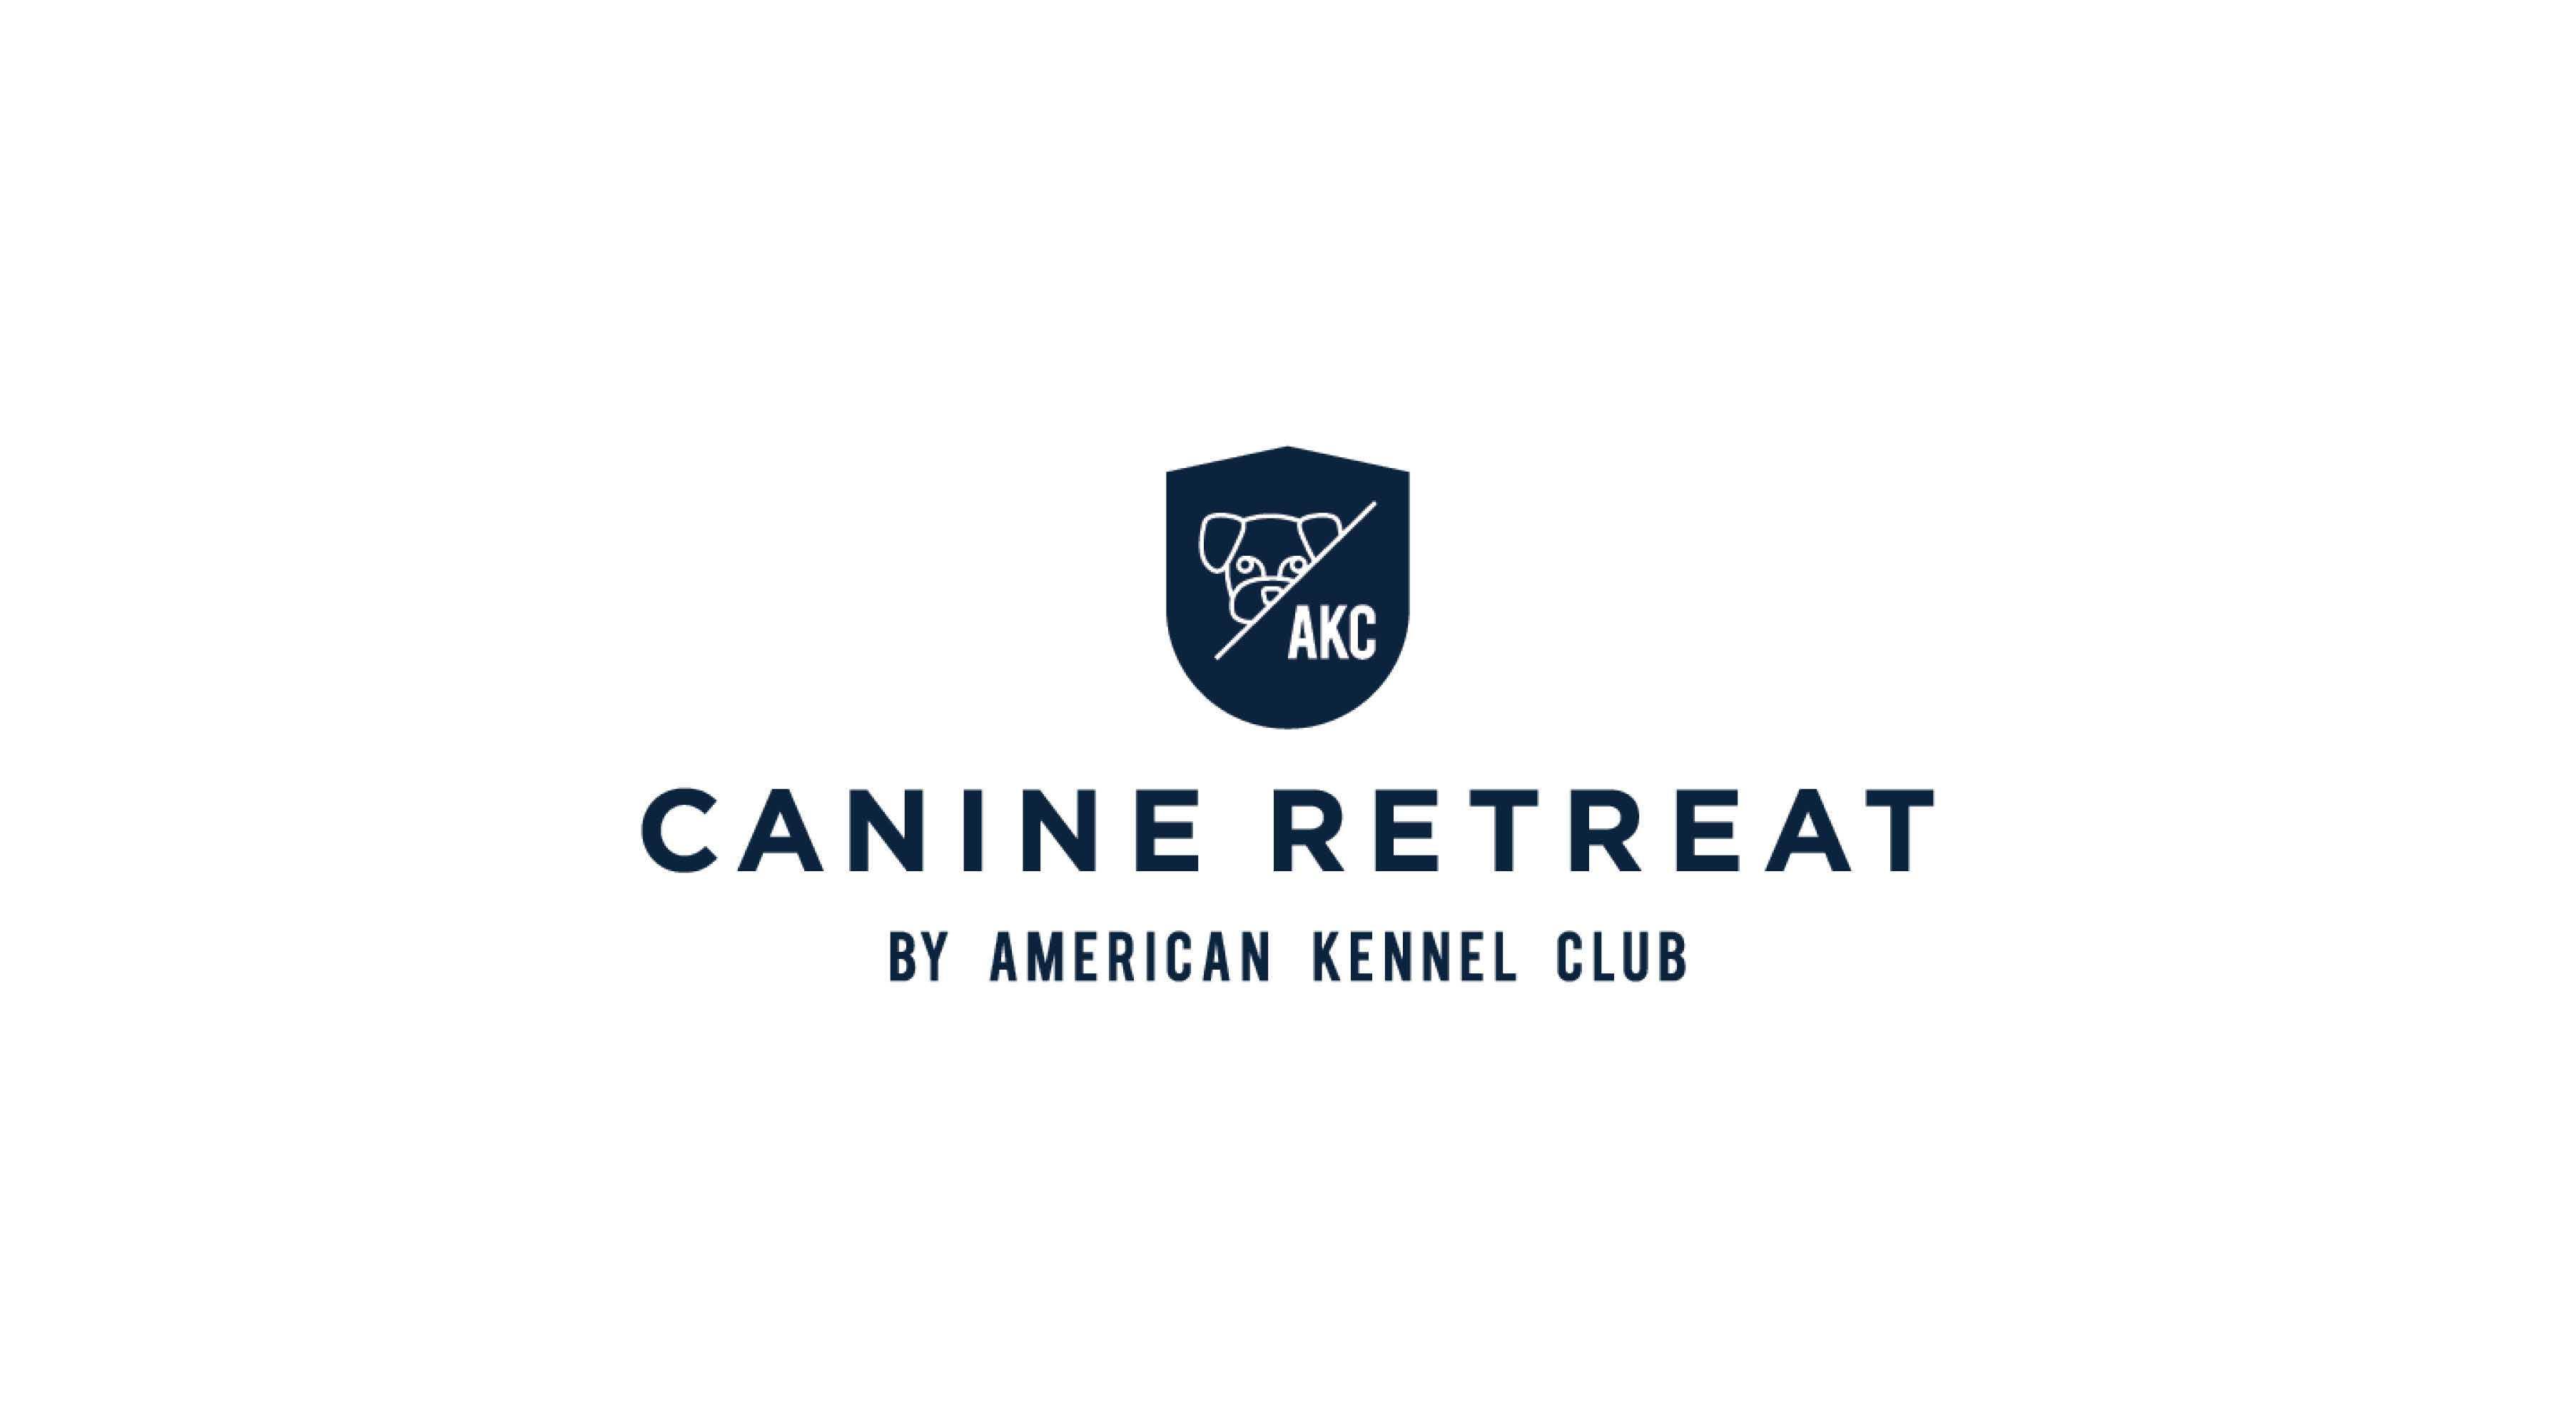 AKC Canine Retreat